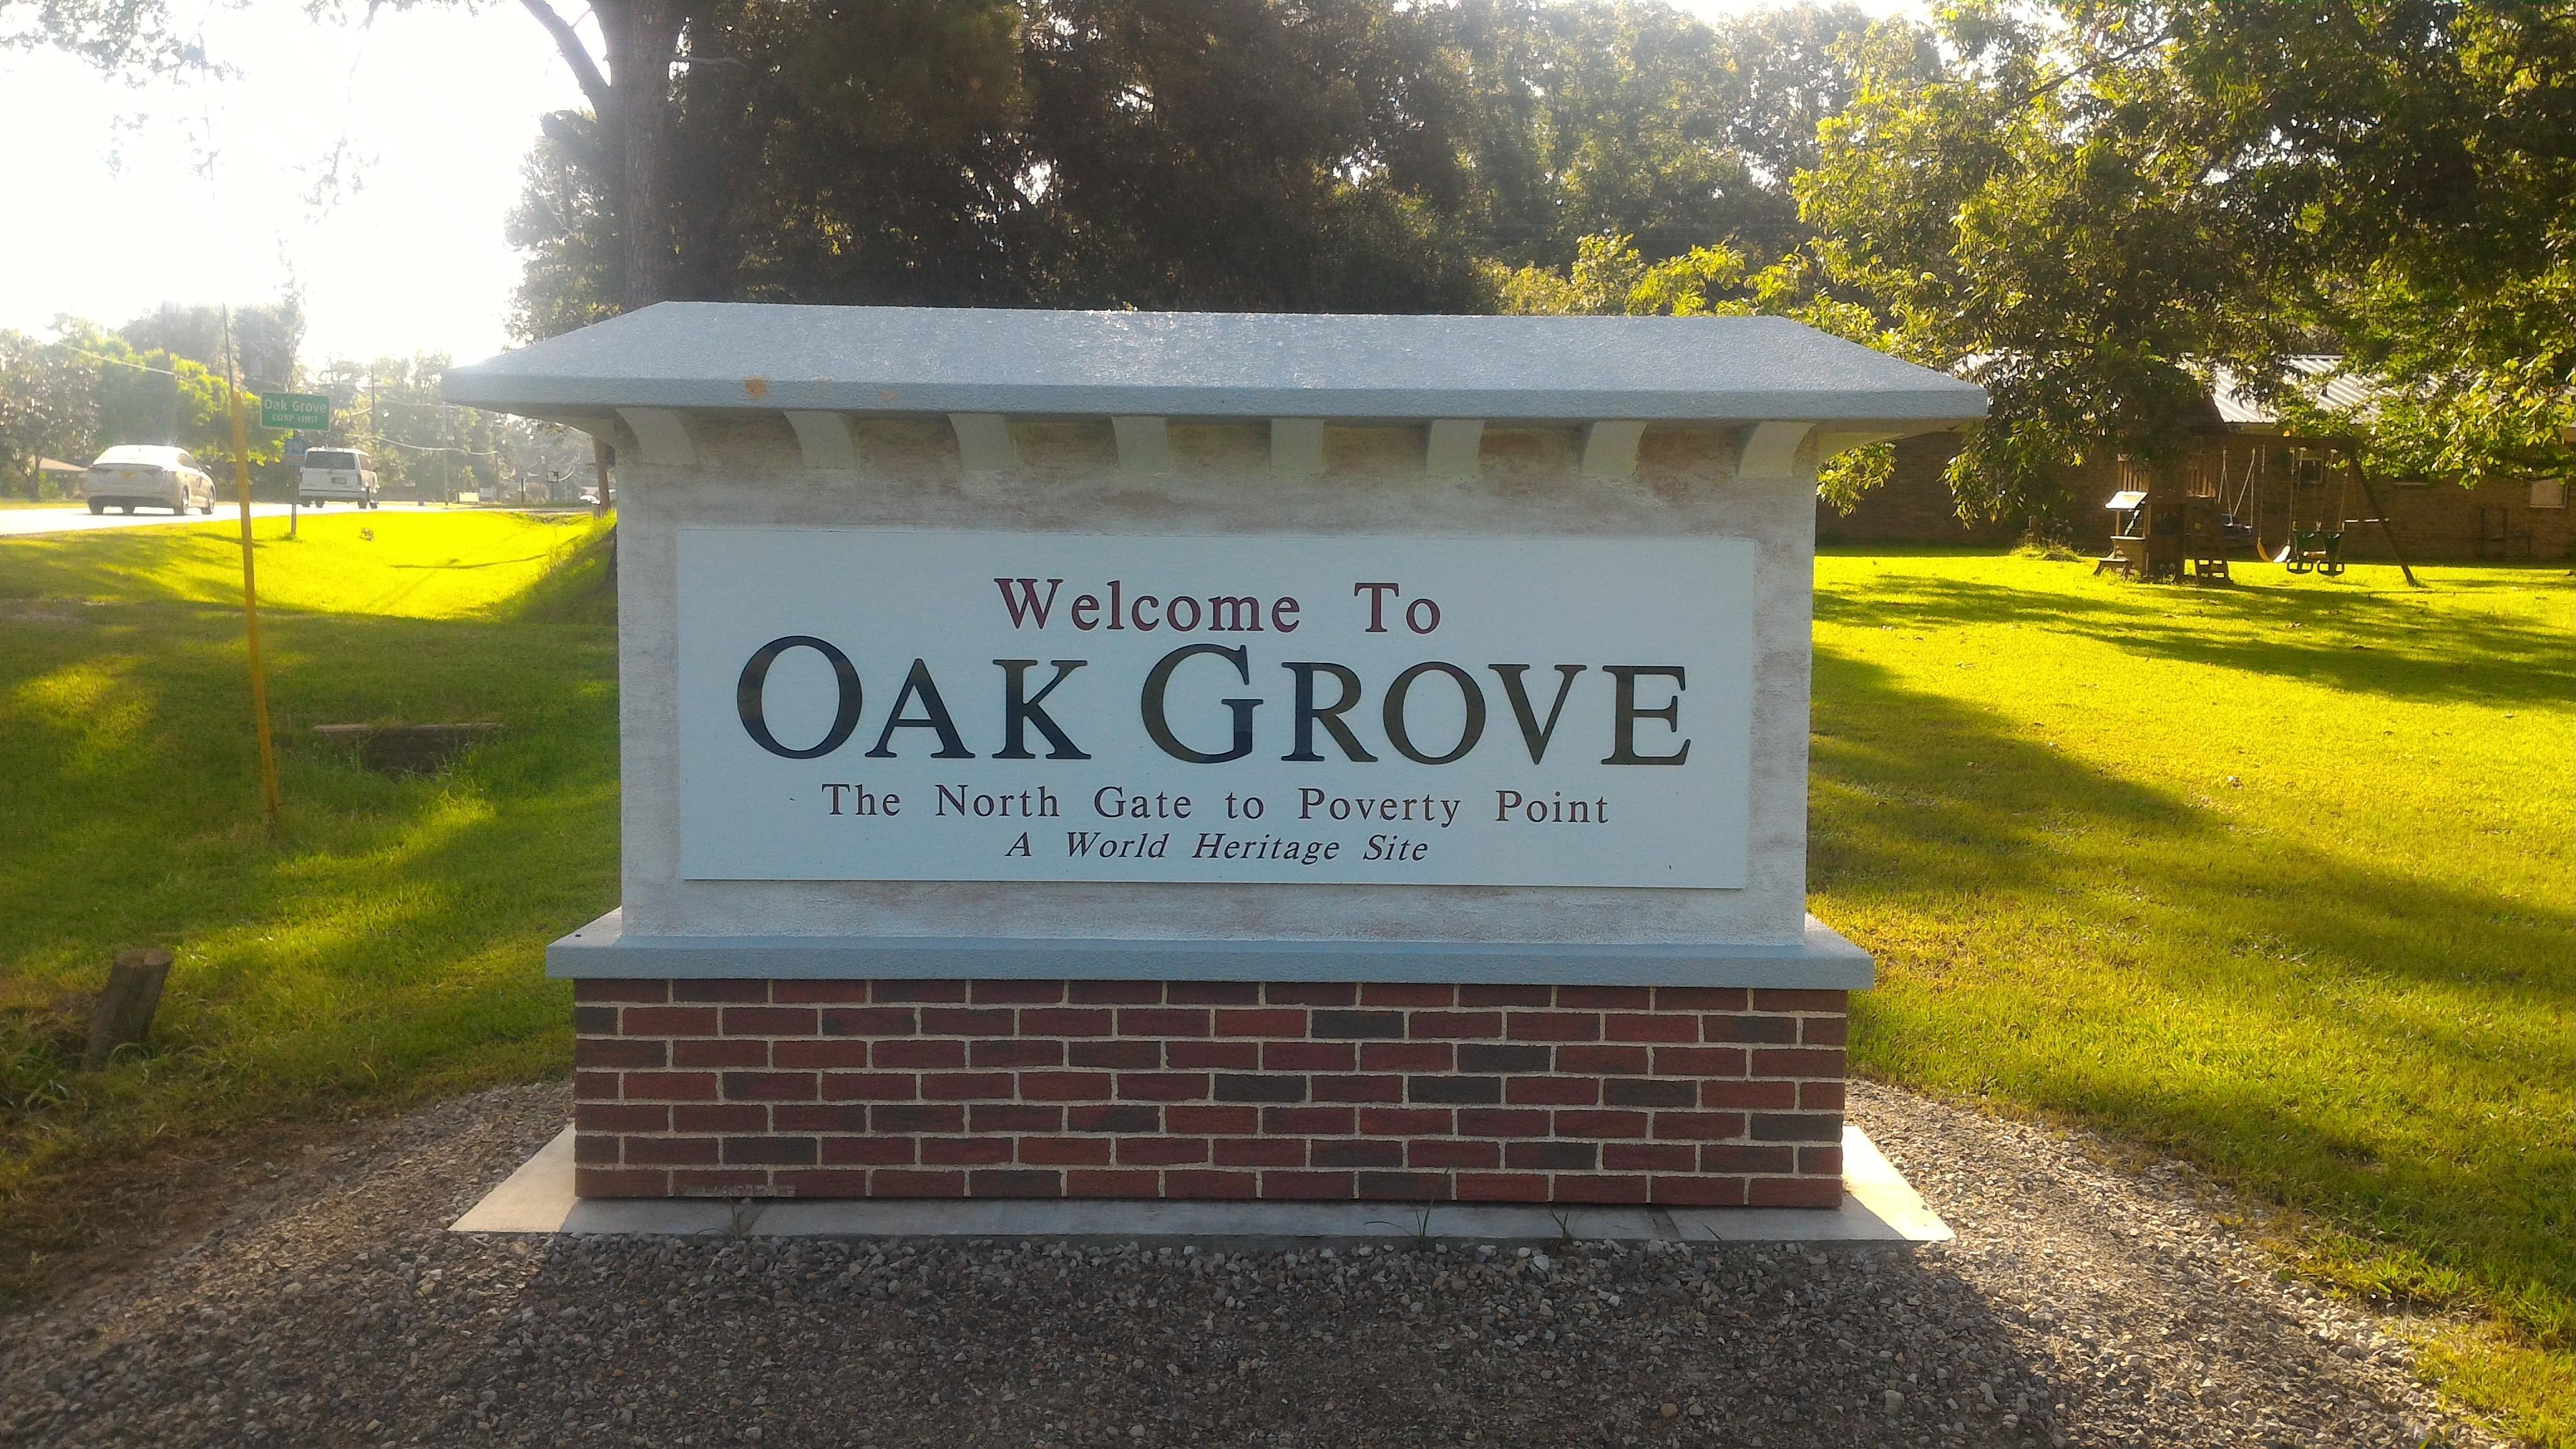 Oak grove la dating